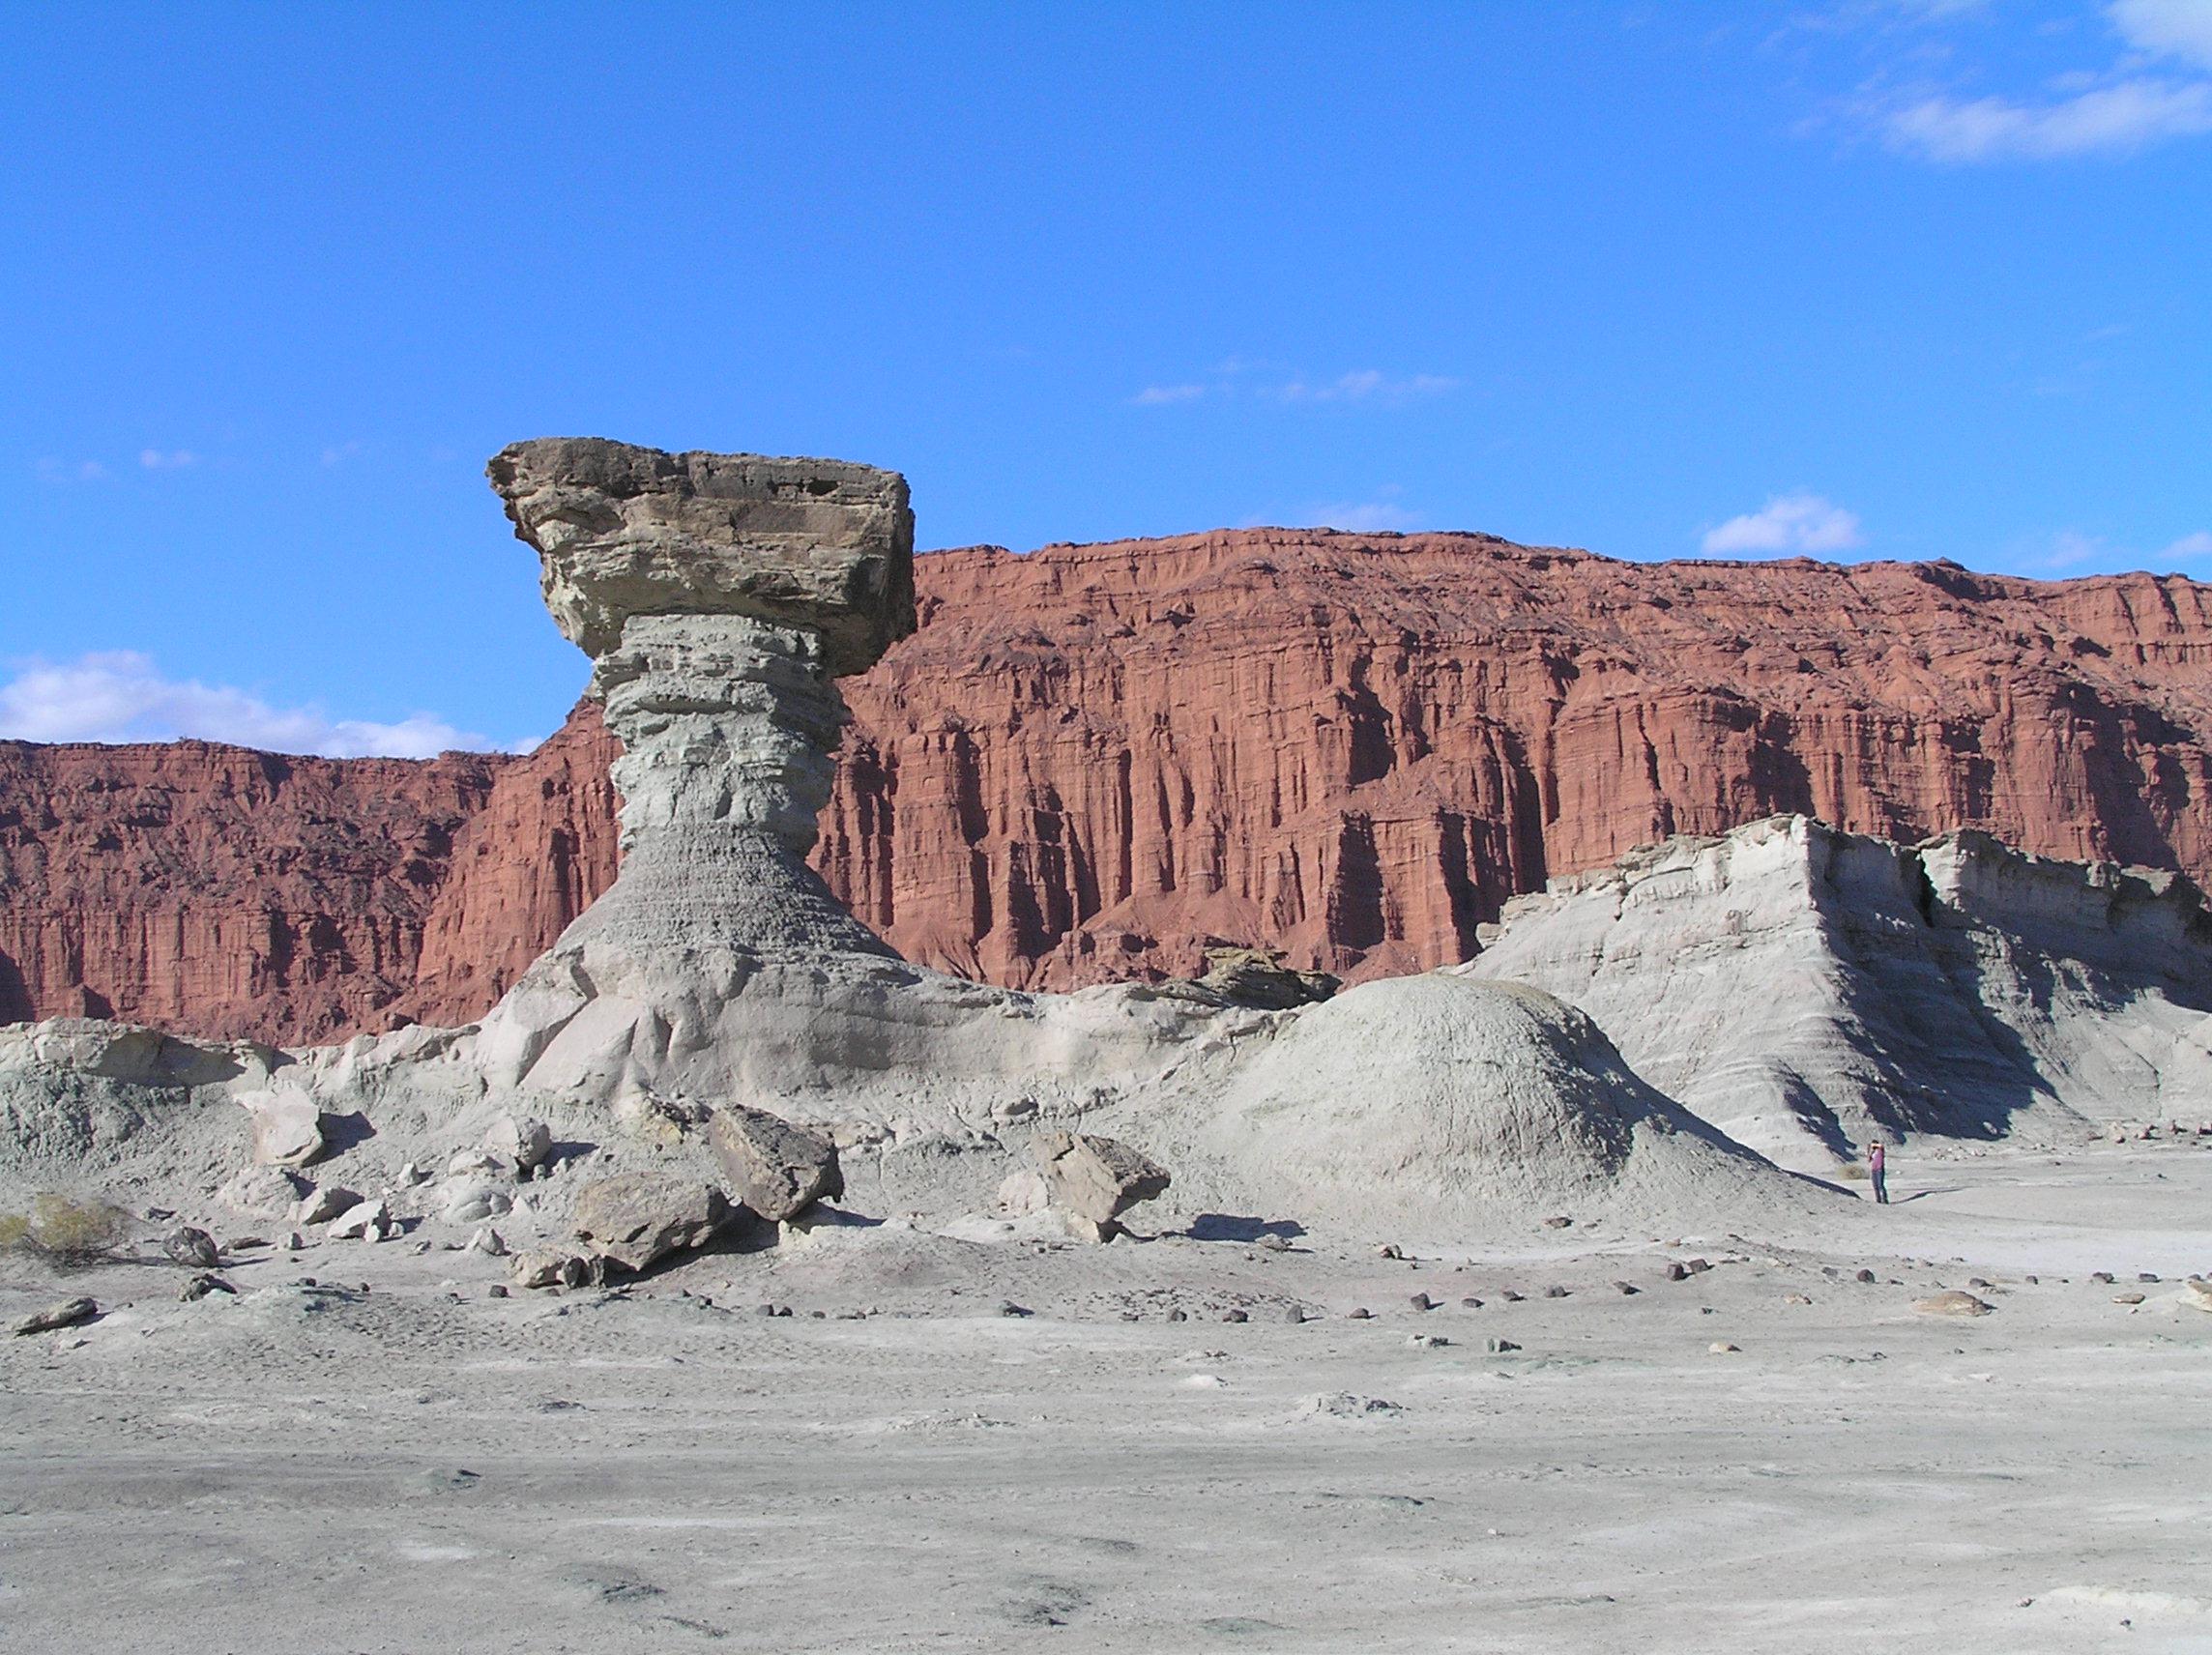 Interessante rotsformatie net buiten San Juan (WikiCommons / M.Bustos)